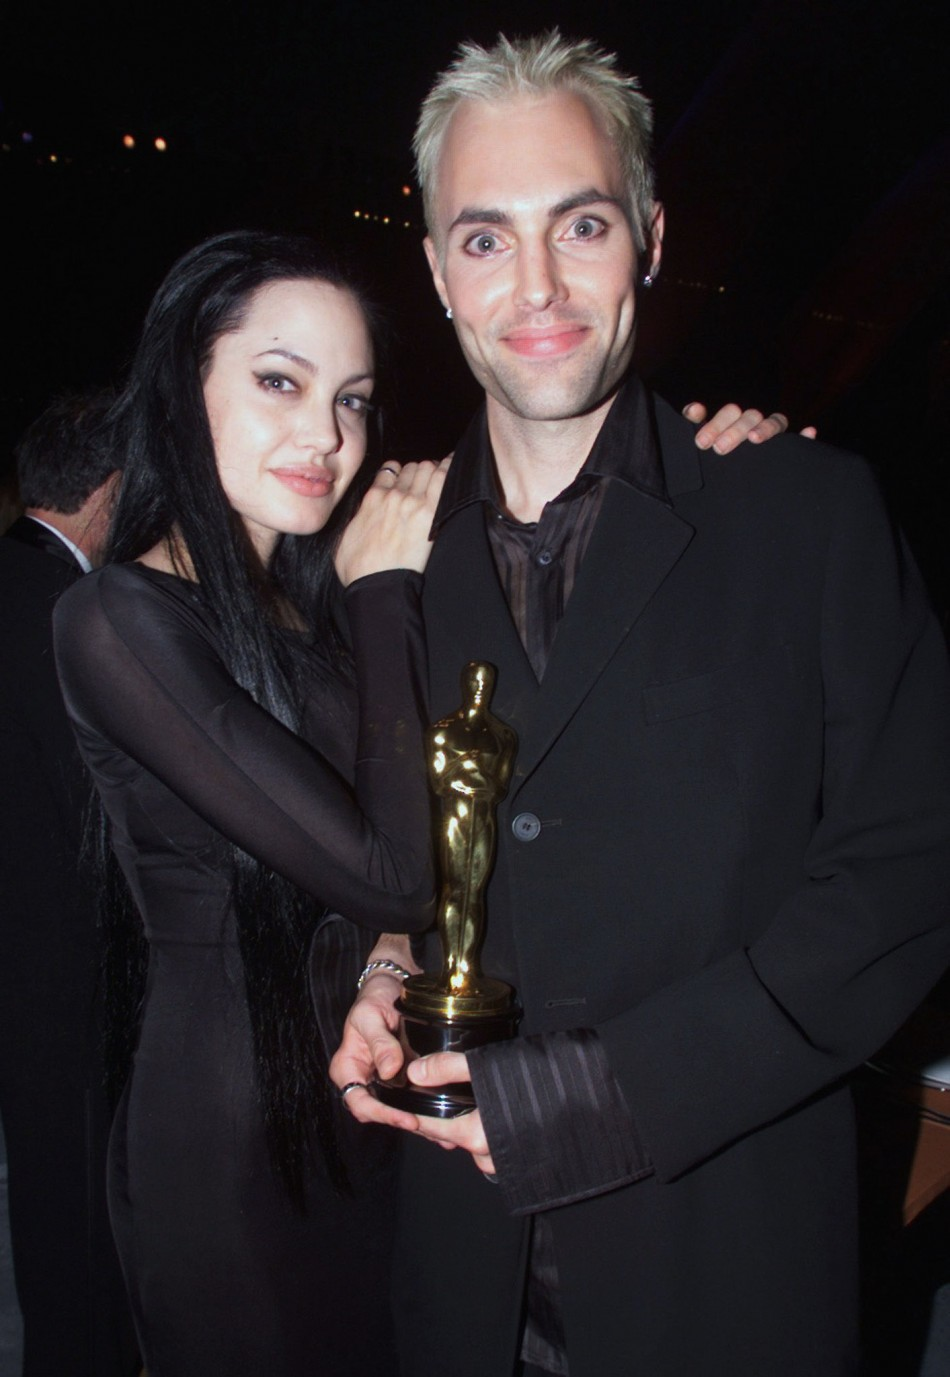 Celebrity Scandals: Angelina Jolie Kissing Her Brother анджелина джоли википедия